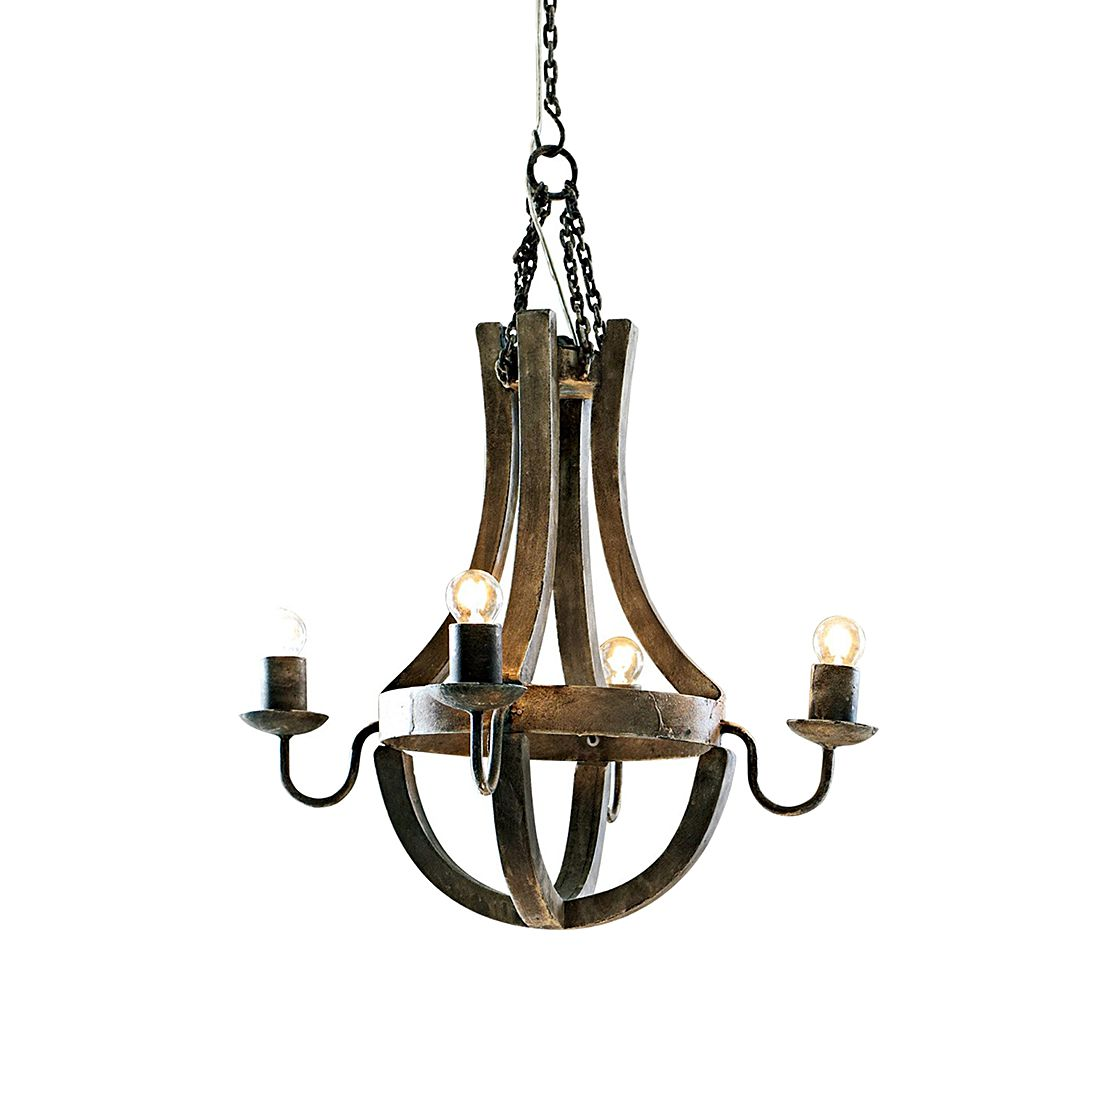 Leuchter Aspen – Holz, Lampenhalter: Eisen natur, Loberon günstig